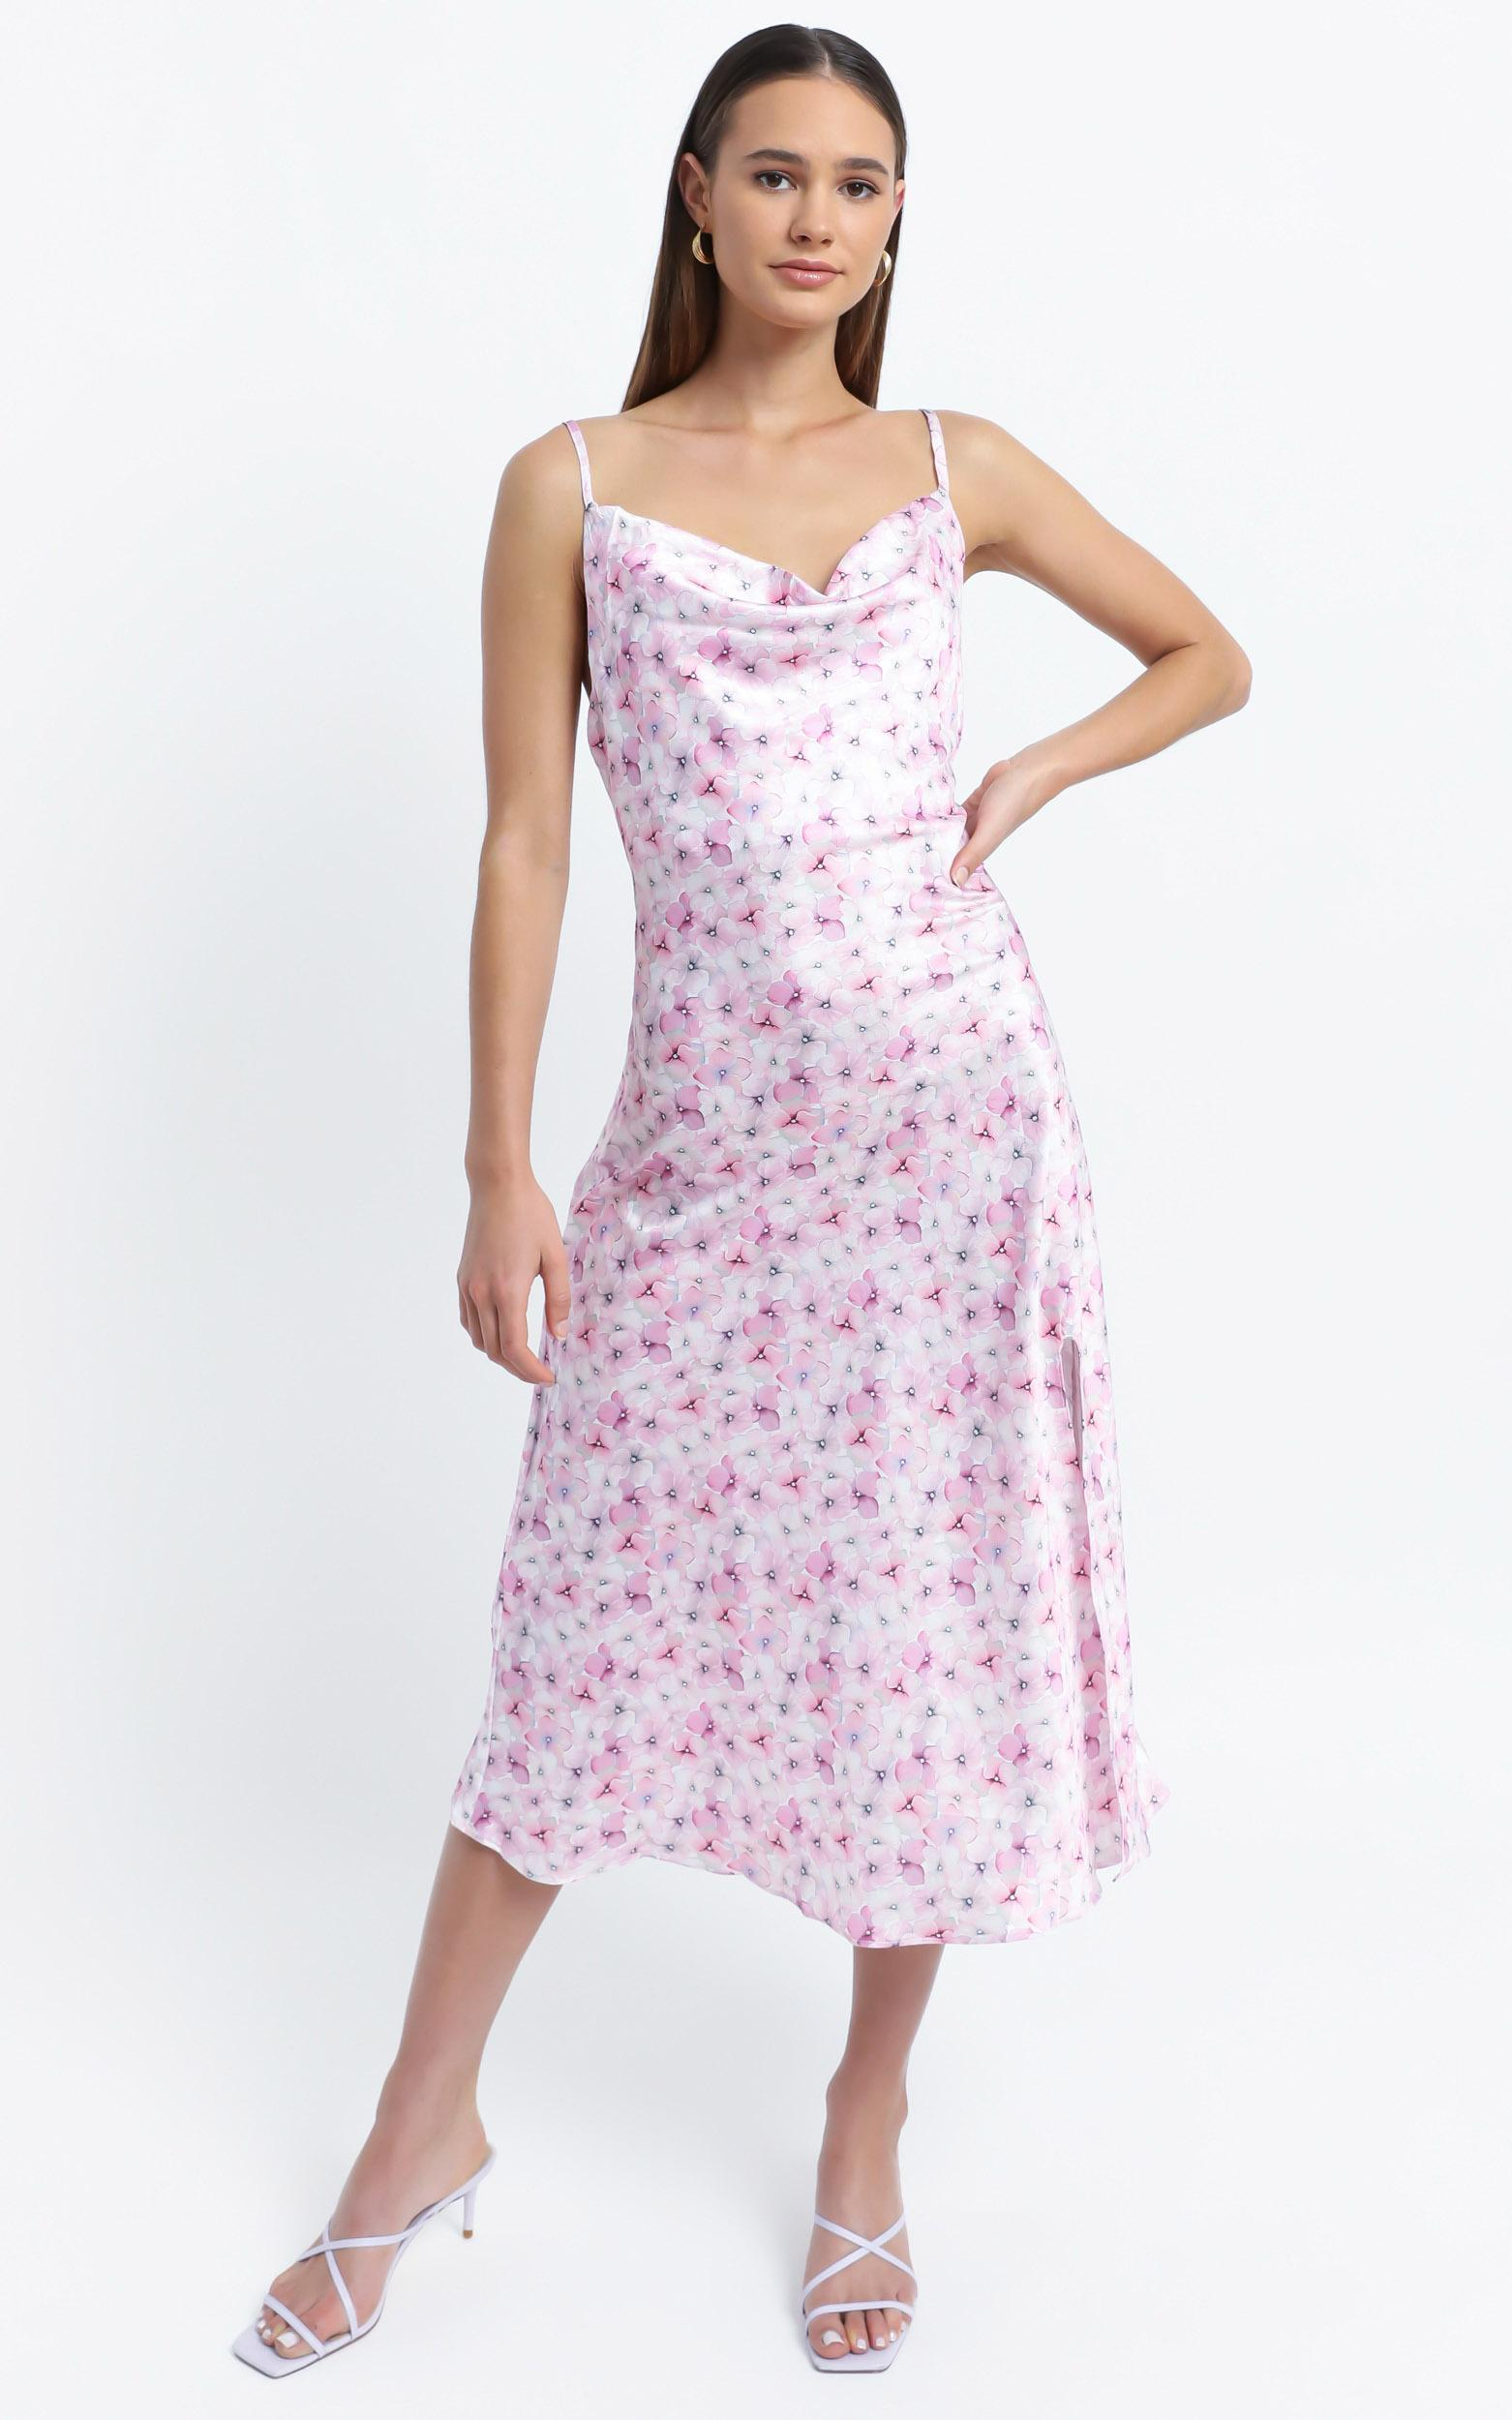 Miana Midi Slip Dress In Purple Floral - 6 (XS), Purple, hi-res image number null